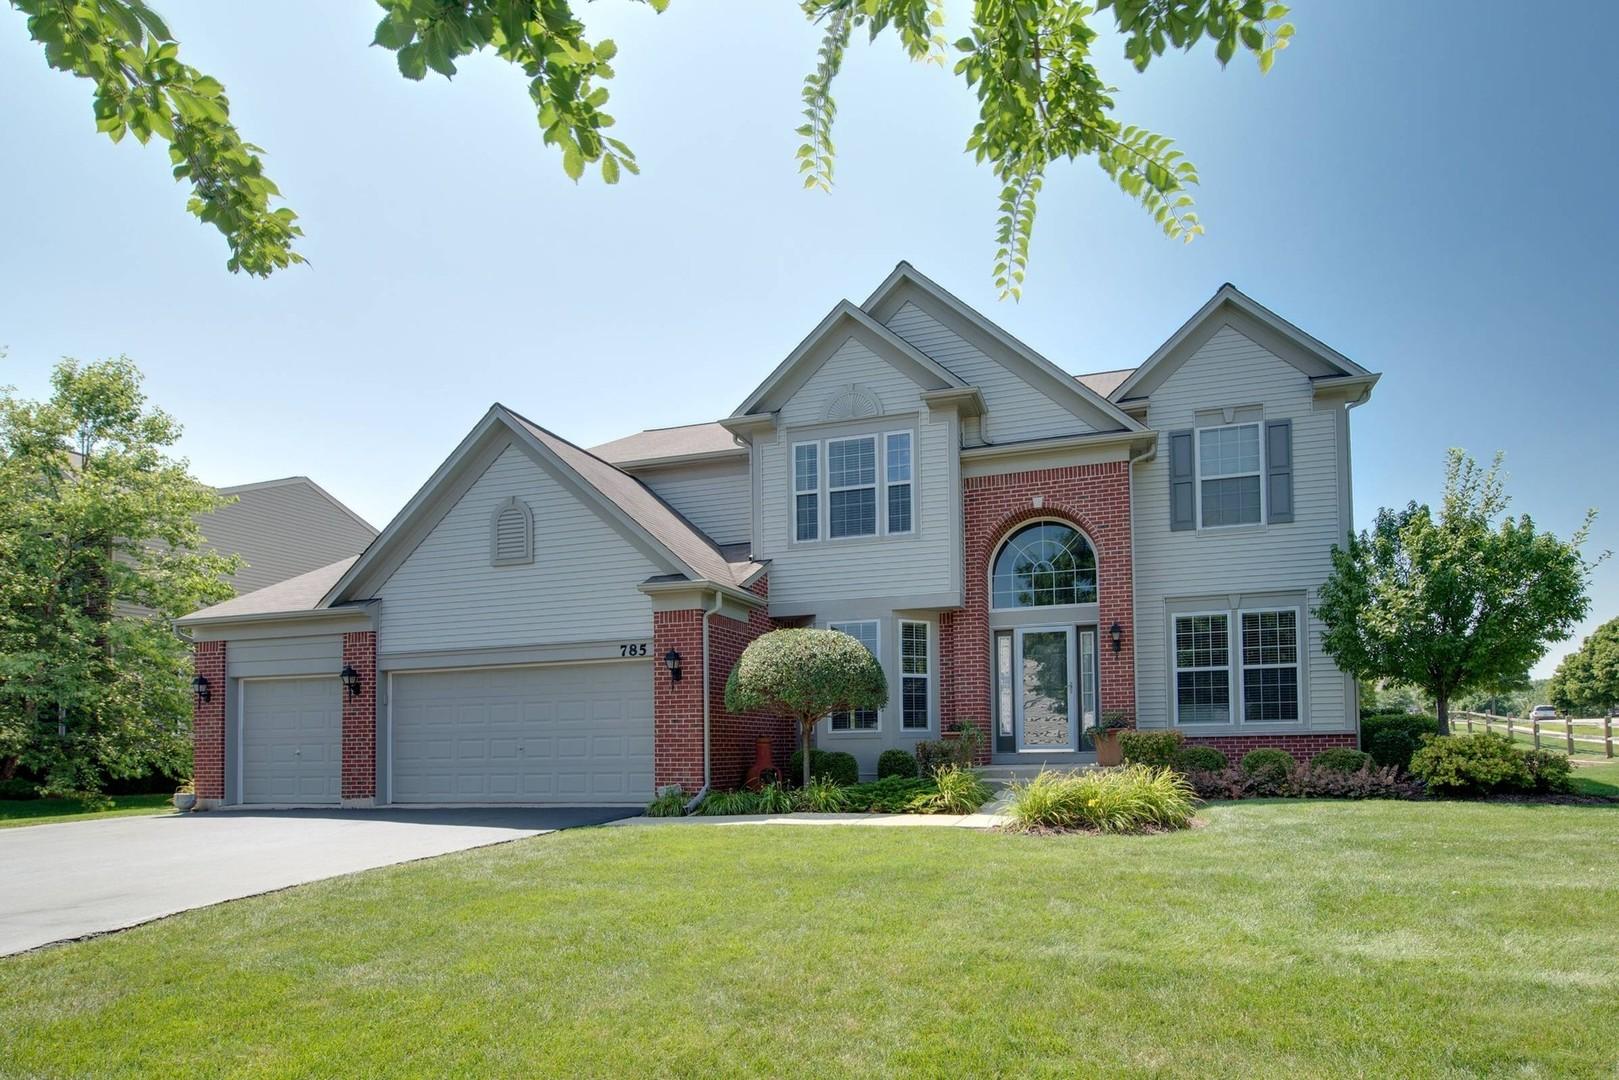 785 Porter Circle, Lindenhurst, Illinois 60046